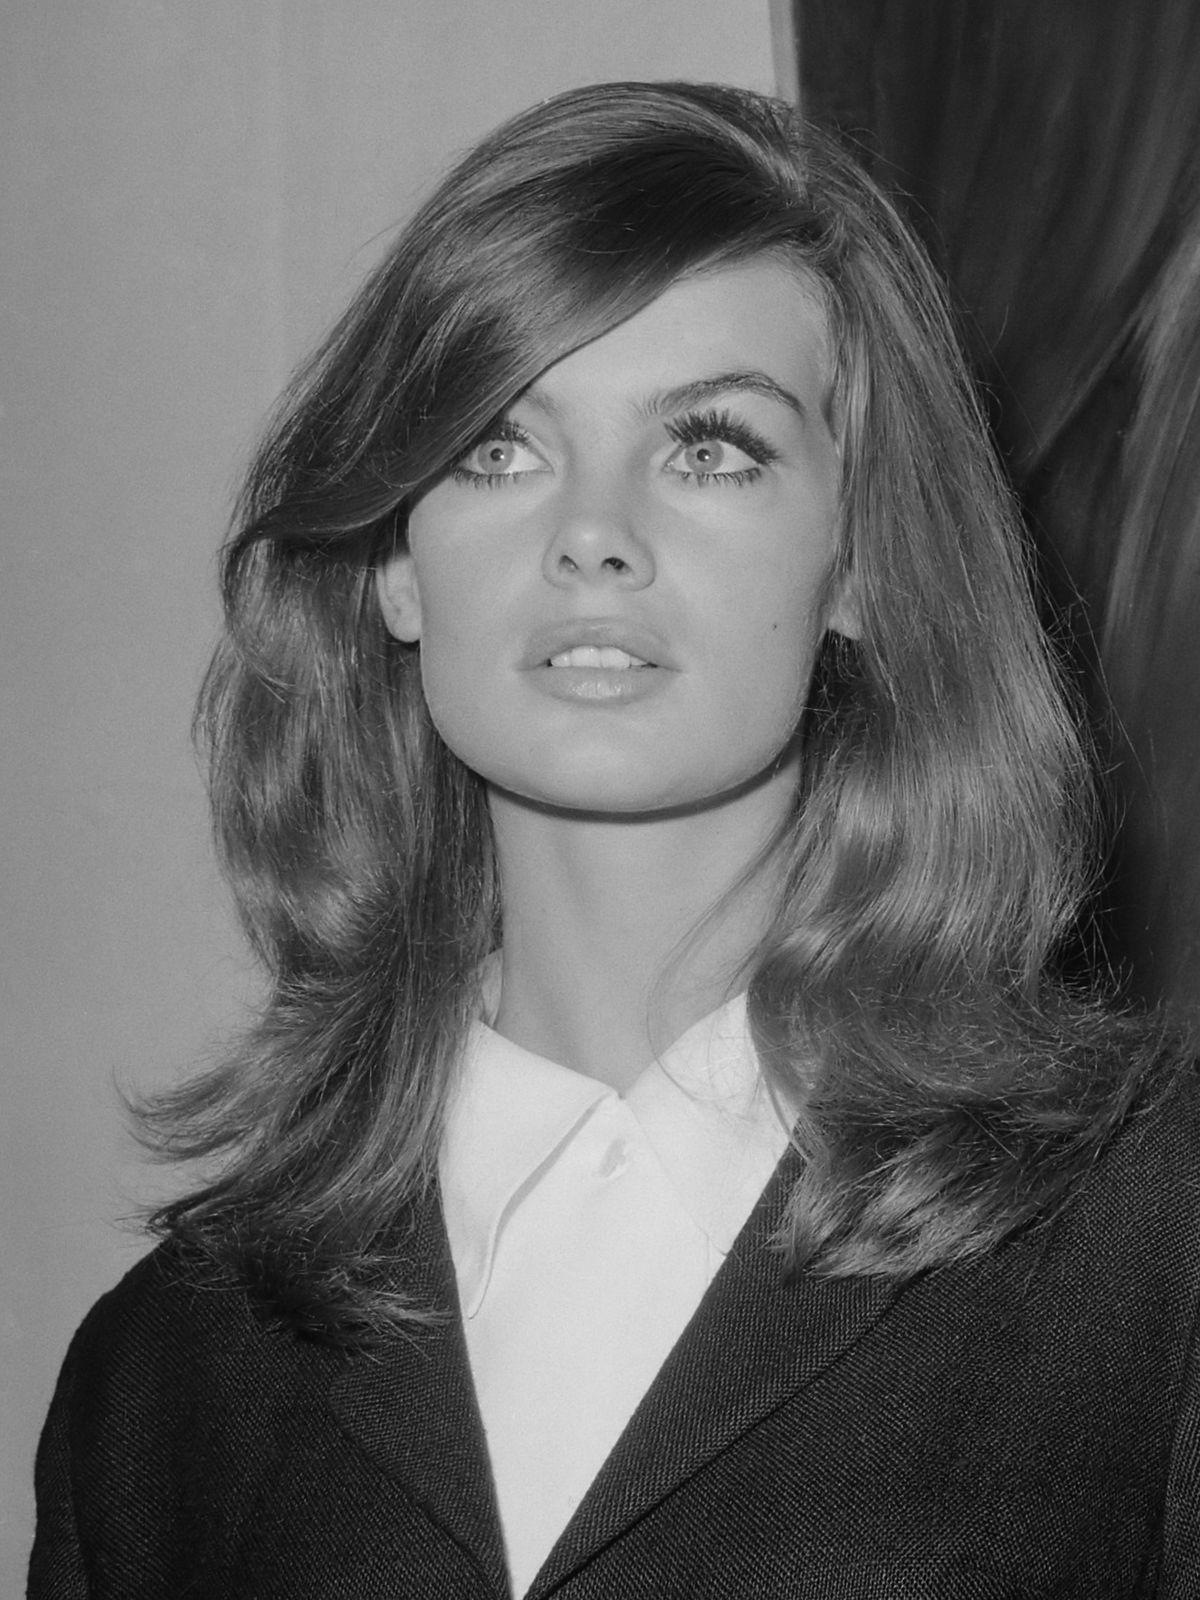 Jean_Shrimpton_(1965).jpg